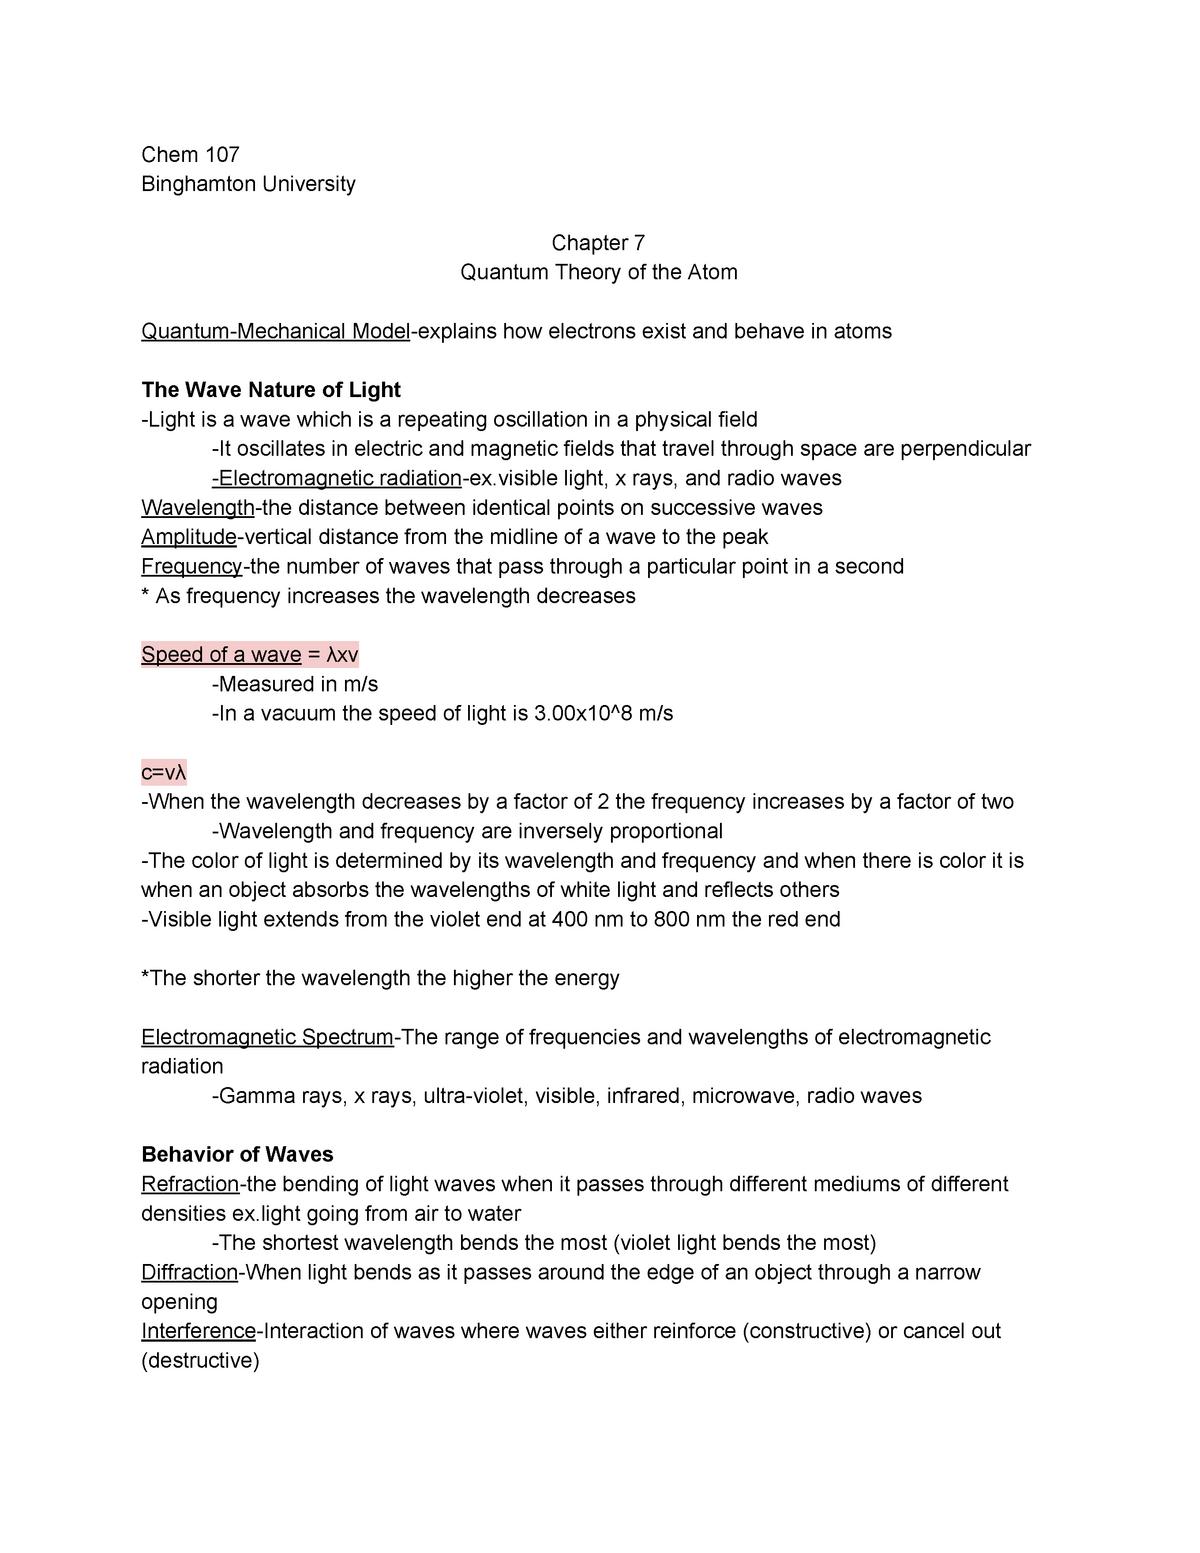 Chem Chapter 7 Quantum Theory of the Atom - Chem 107 - StuDocu